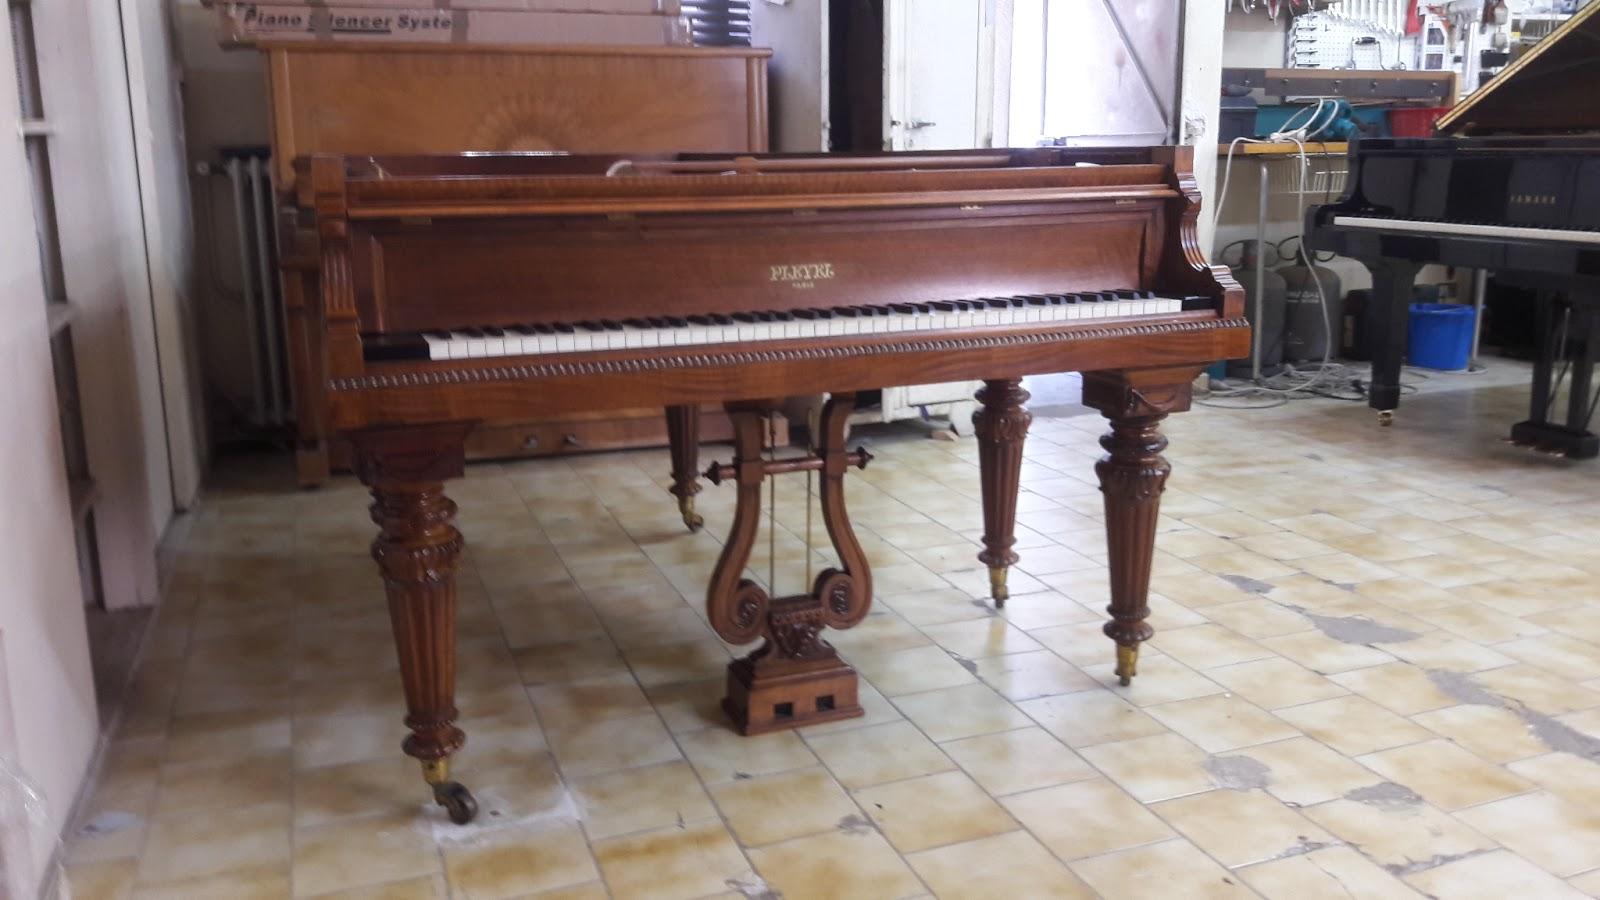 France Pianos Le Blog Du Piano Restauration D Un Superbe Piano